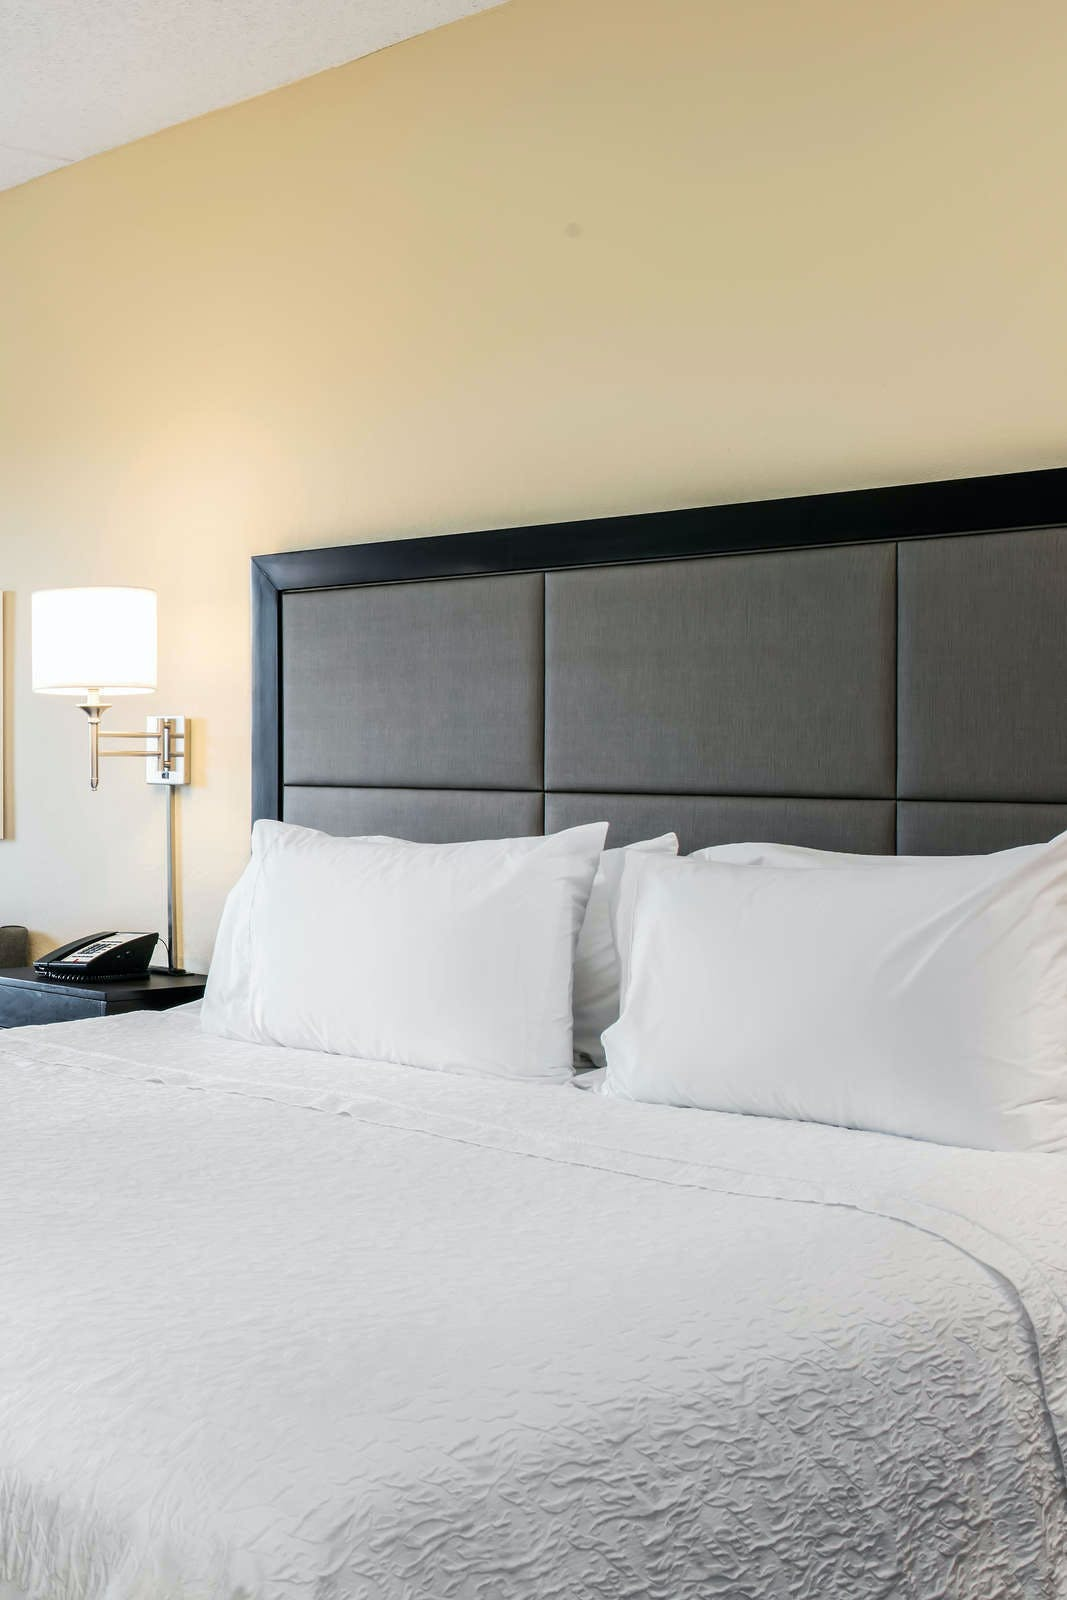 Hampton Inn by Hilton - Hallandale Beach Aventura